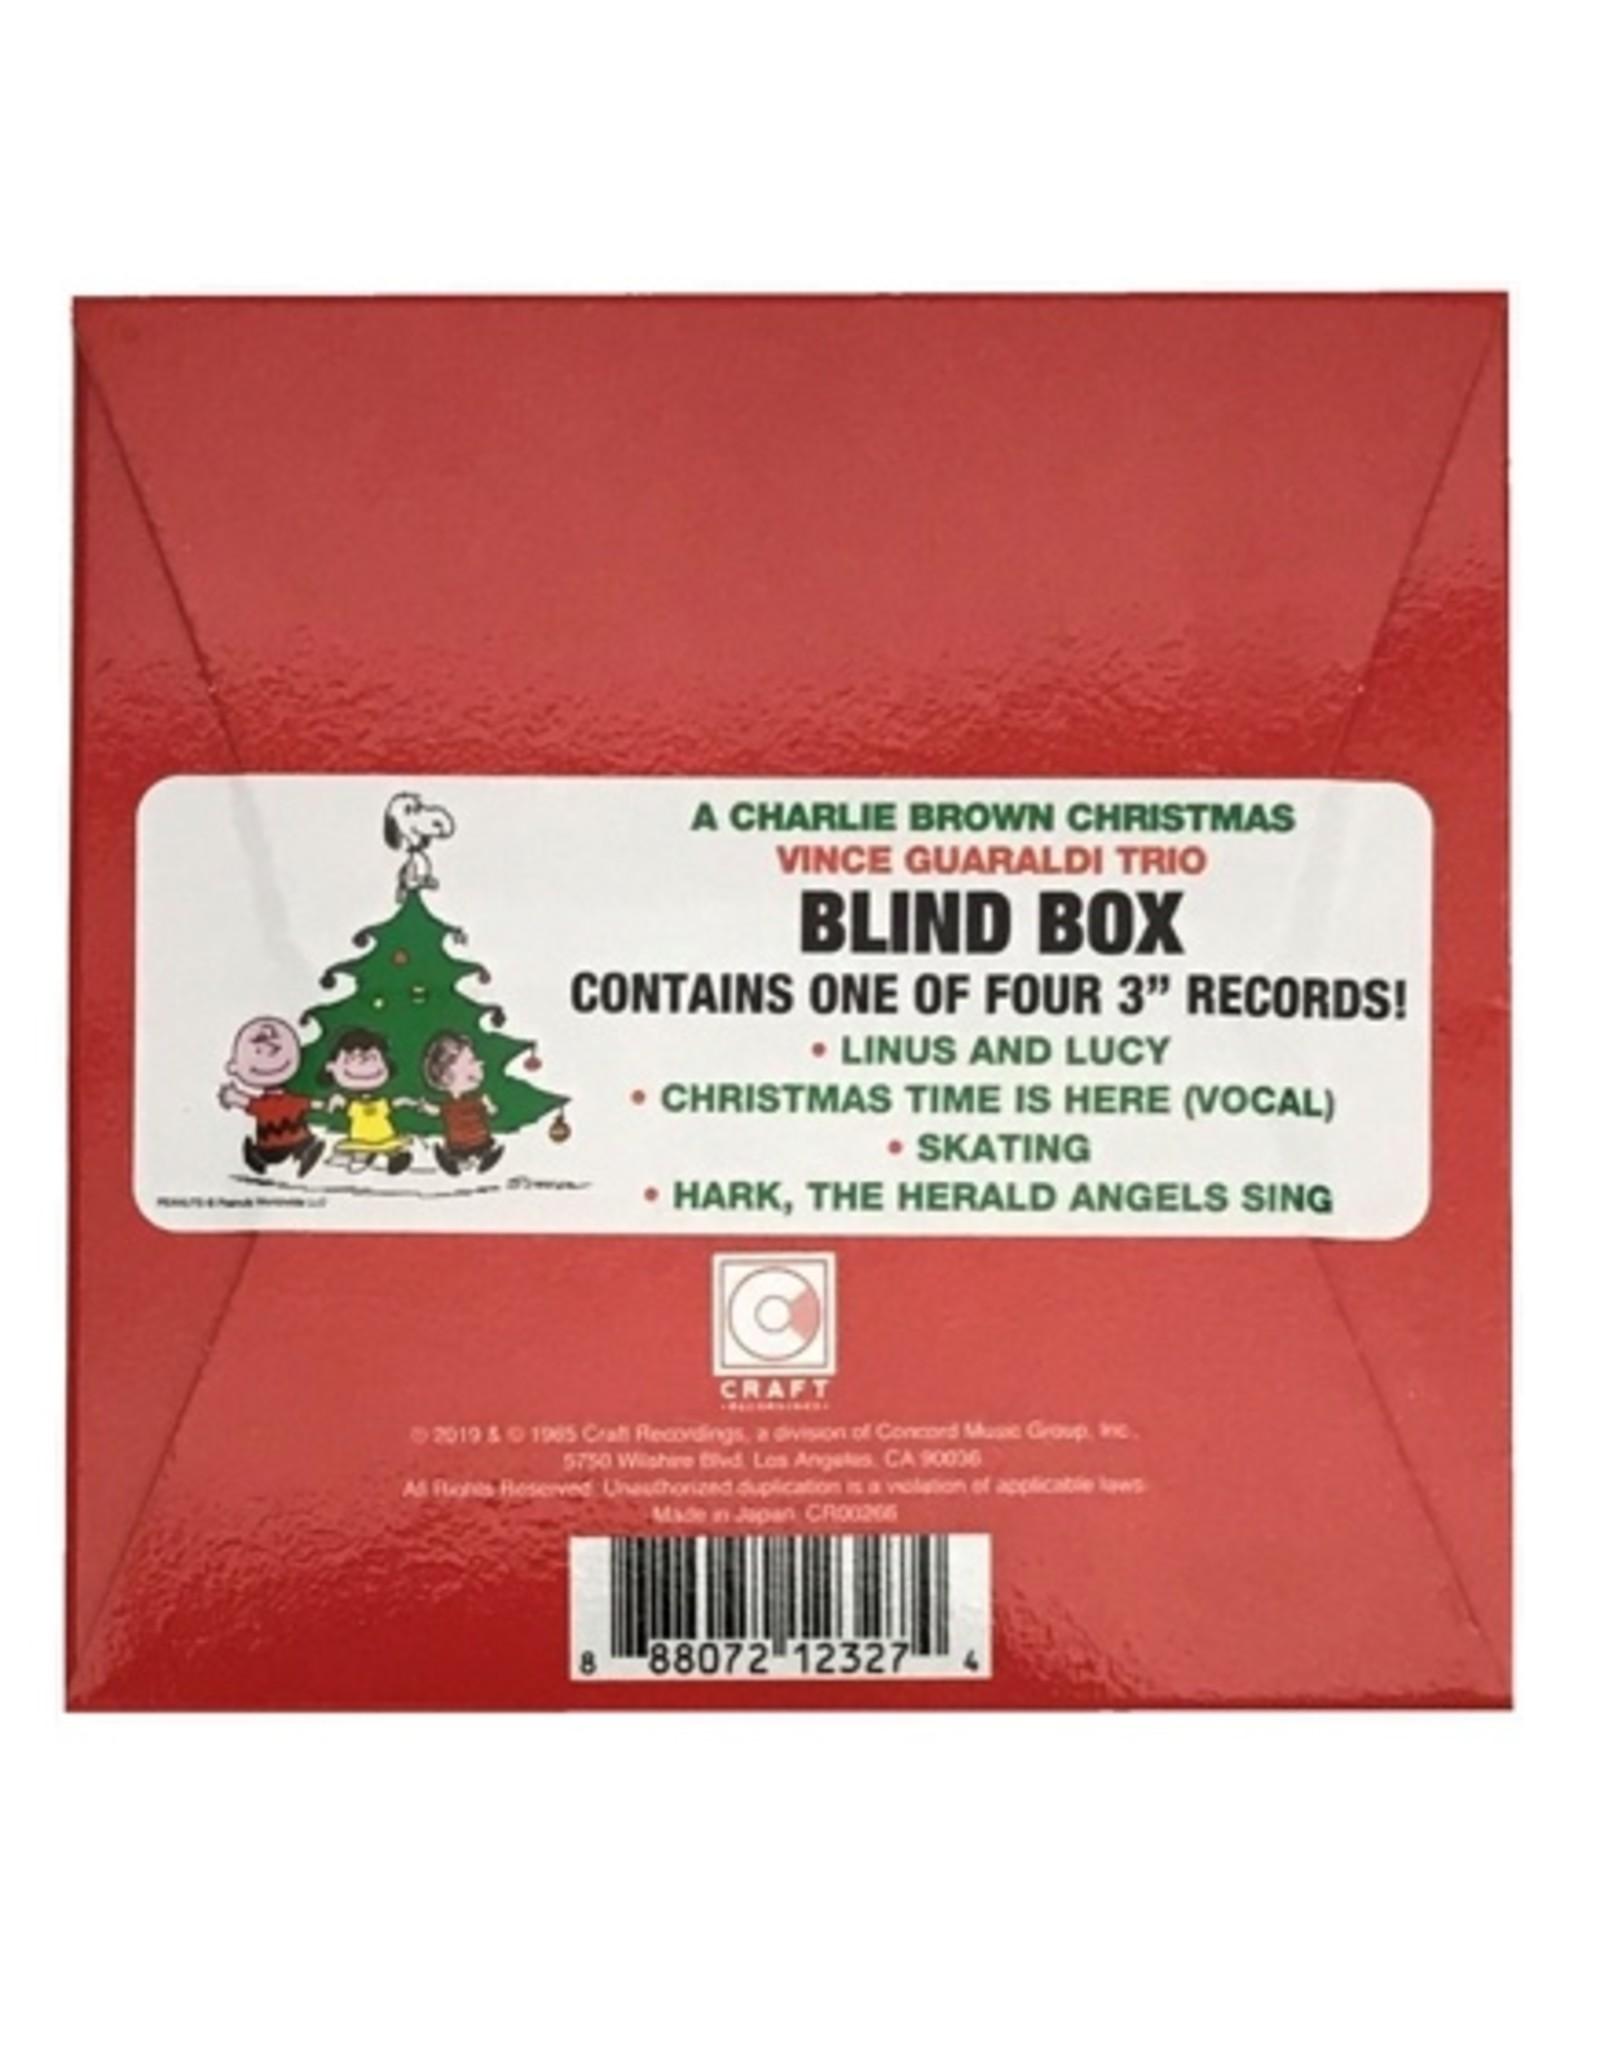 Vince Guaraldi - Charlie Brown Christmas Rsd3 Blindbox